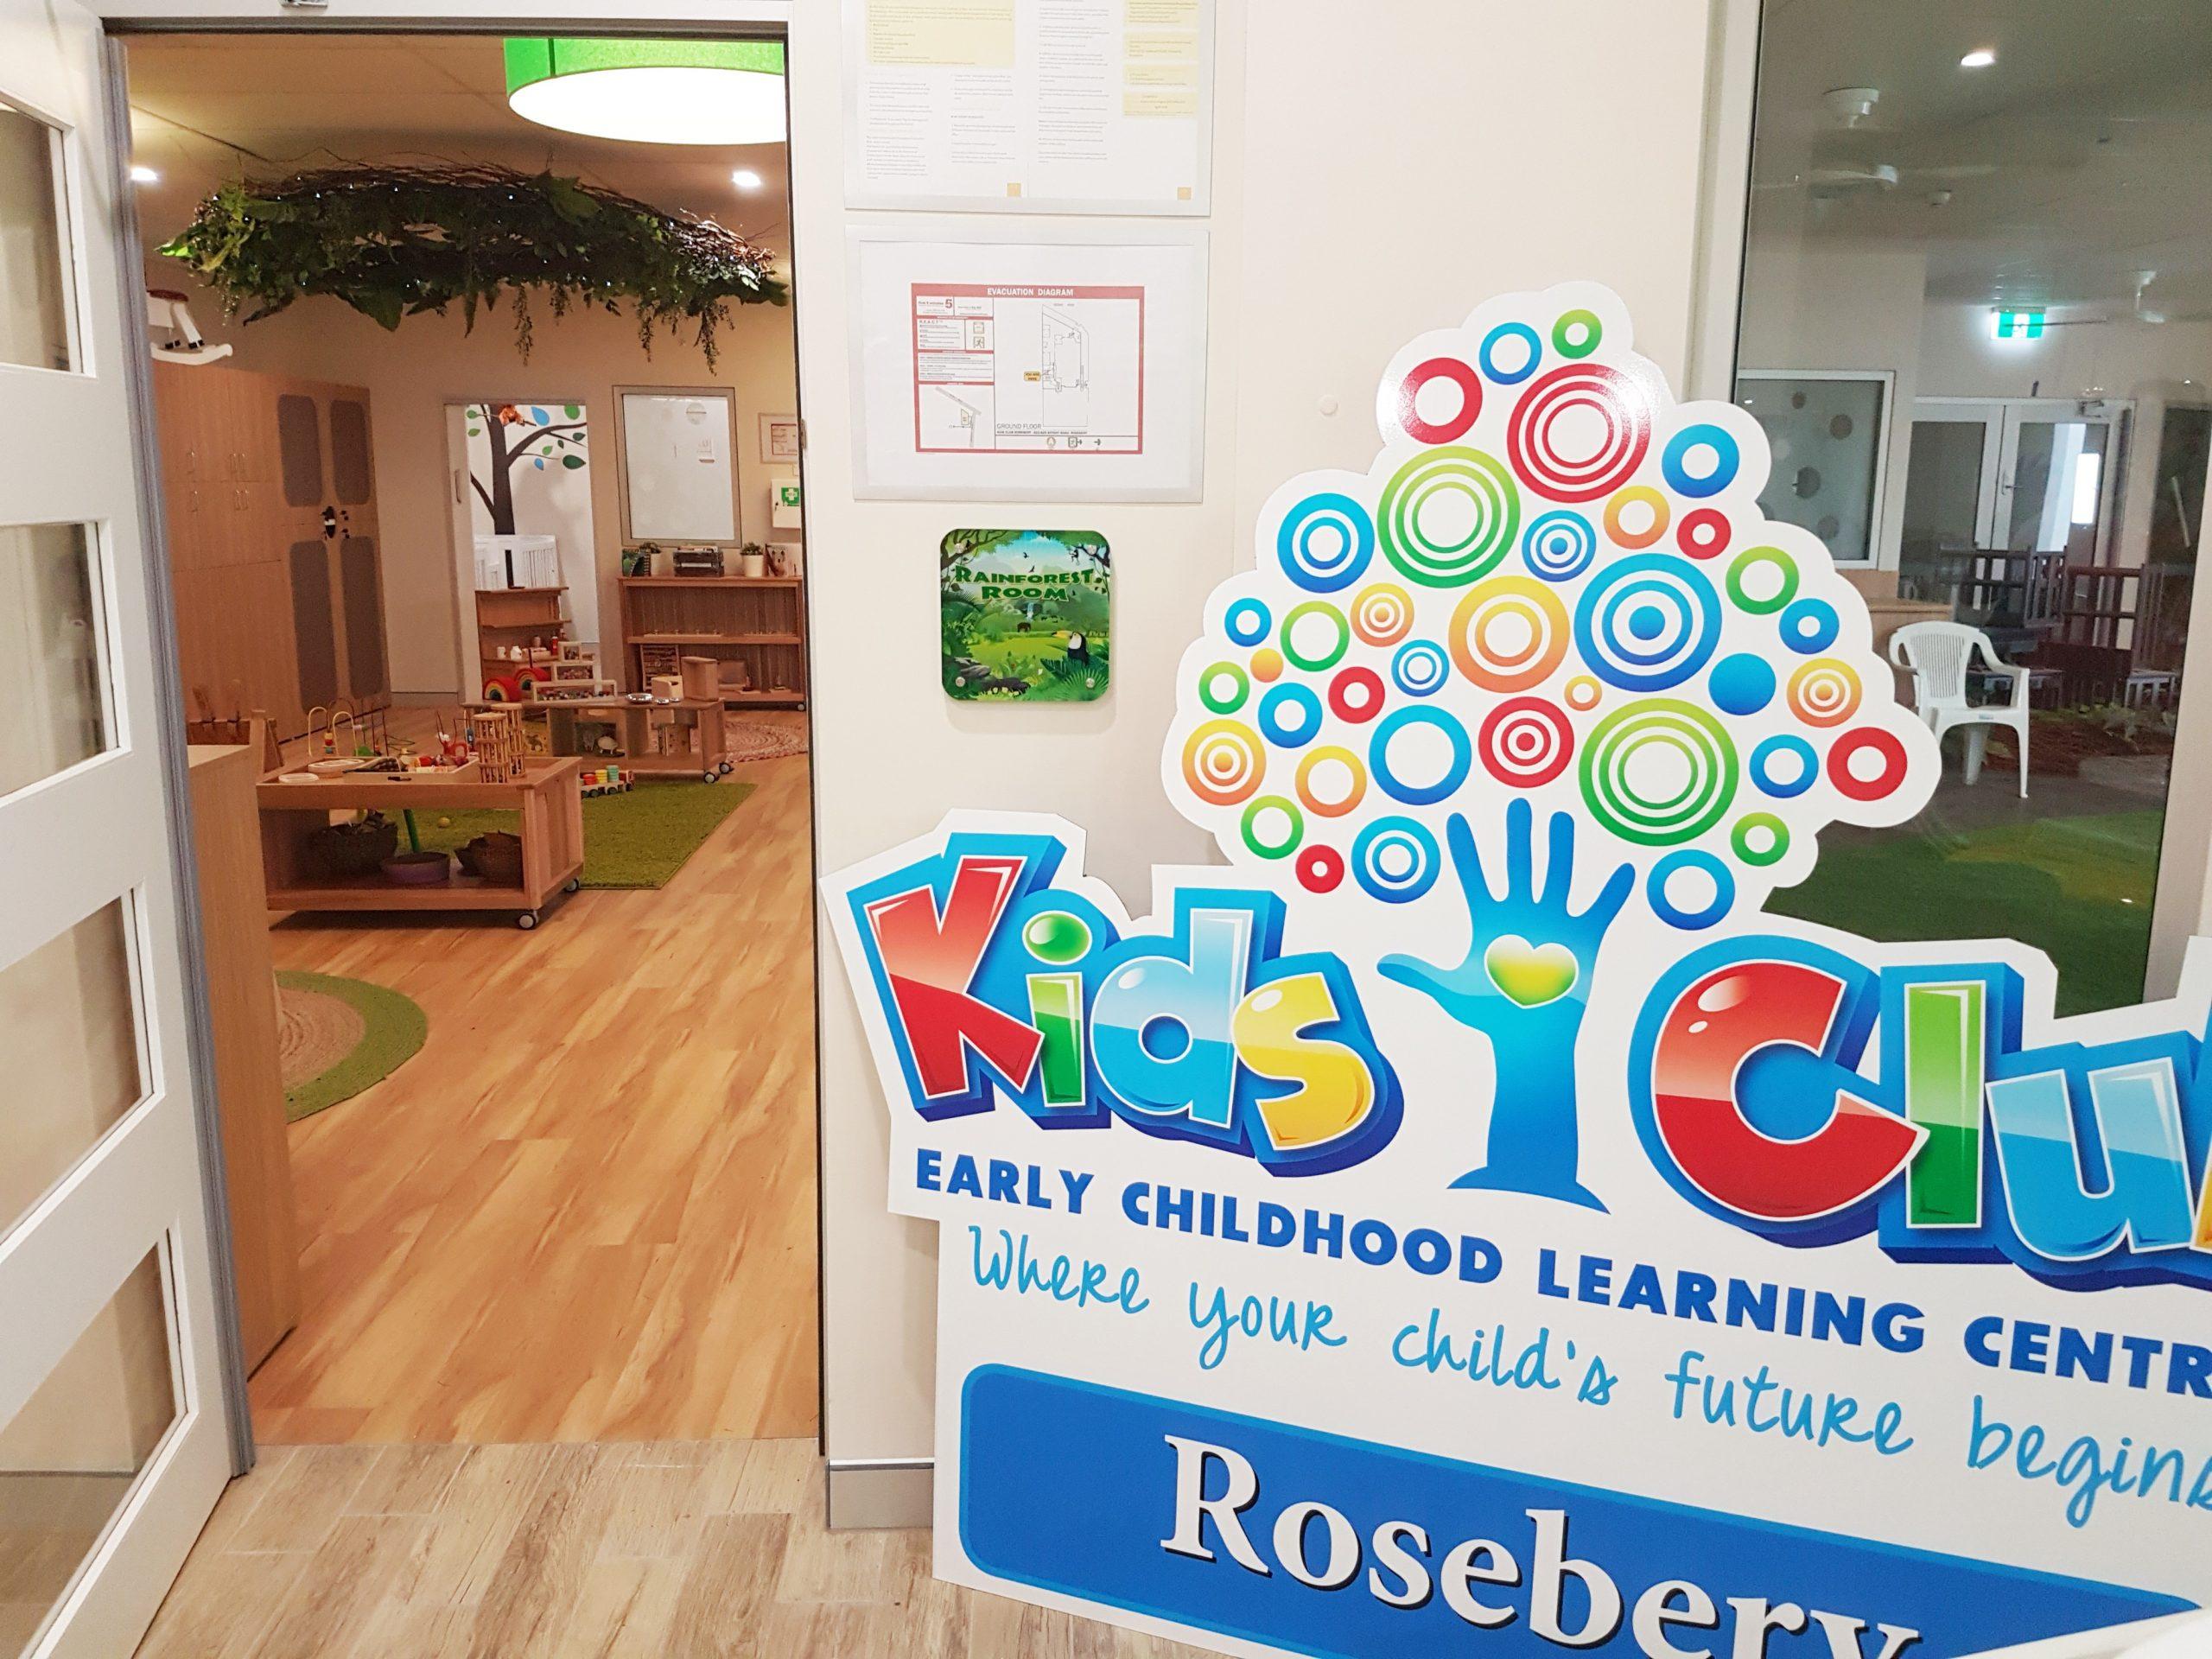 Ngoc, Kids Club Rosebery Parent